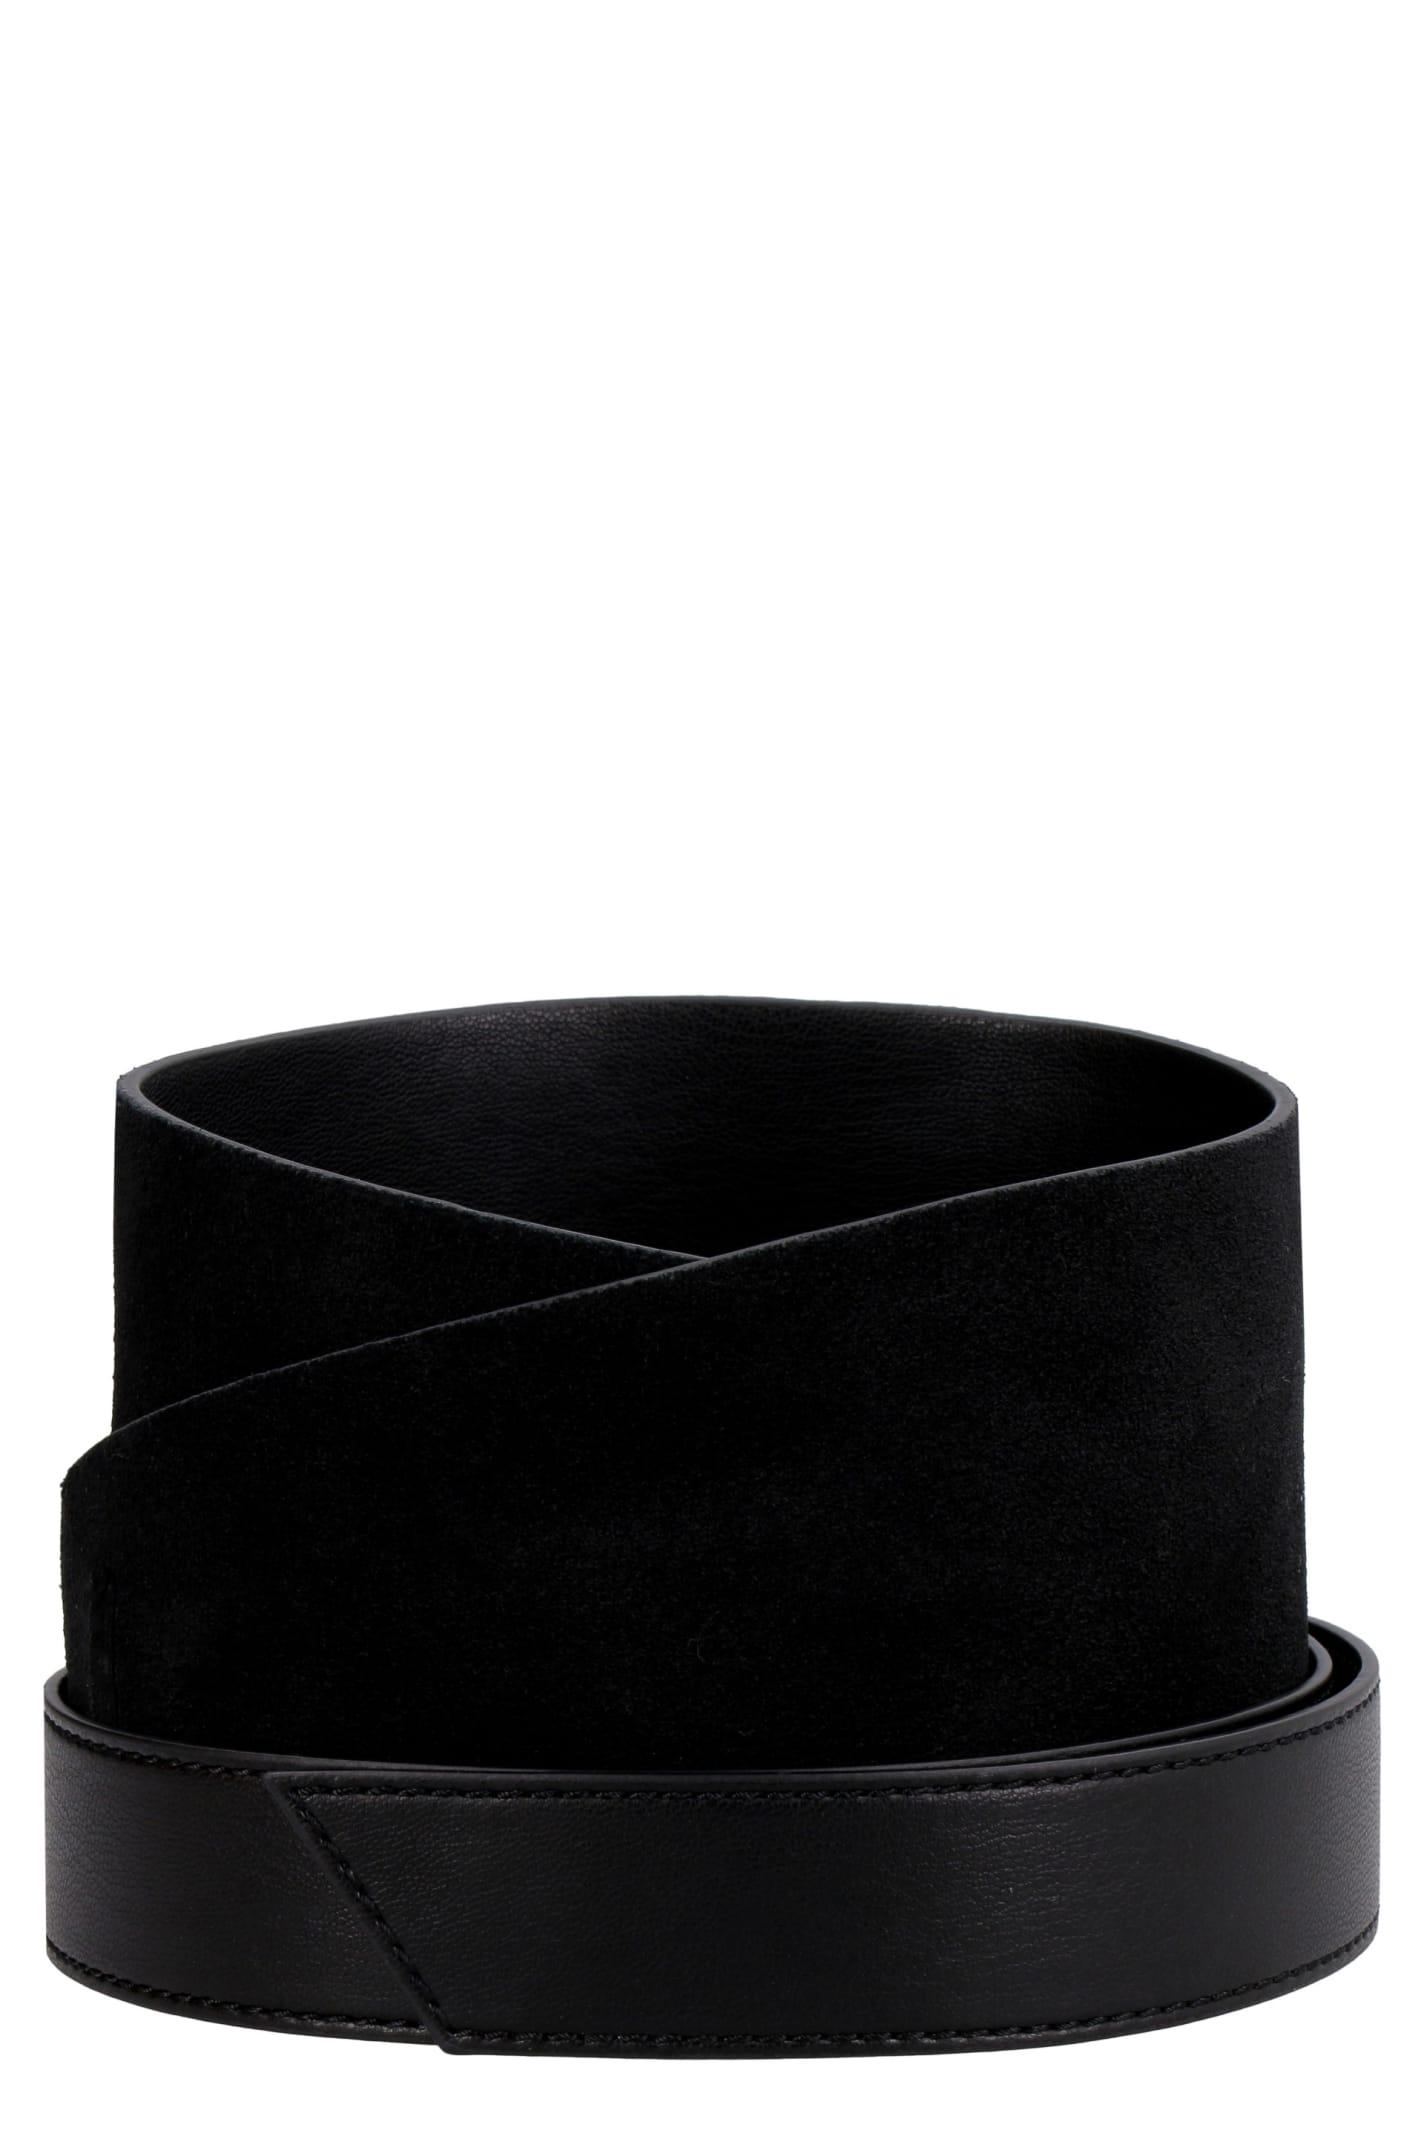 Pinko Taylor Leather Obi-belt In Black